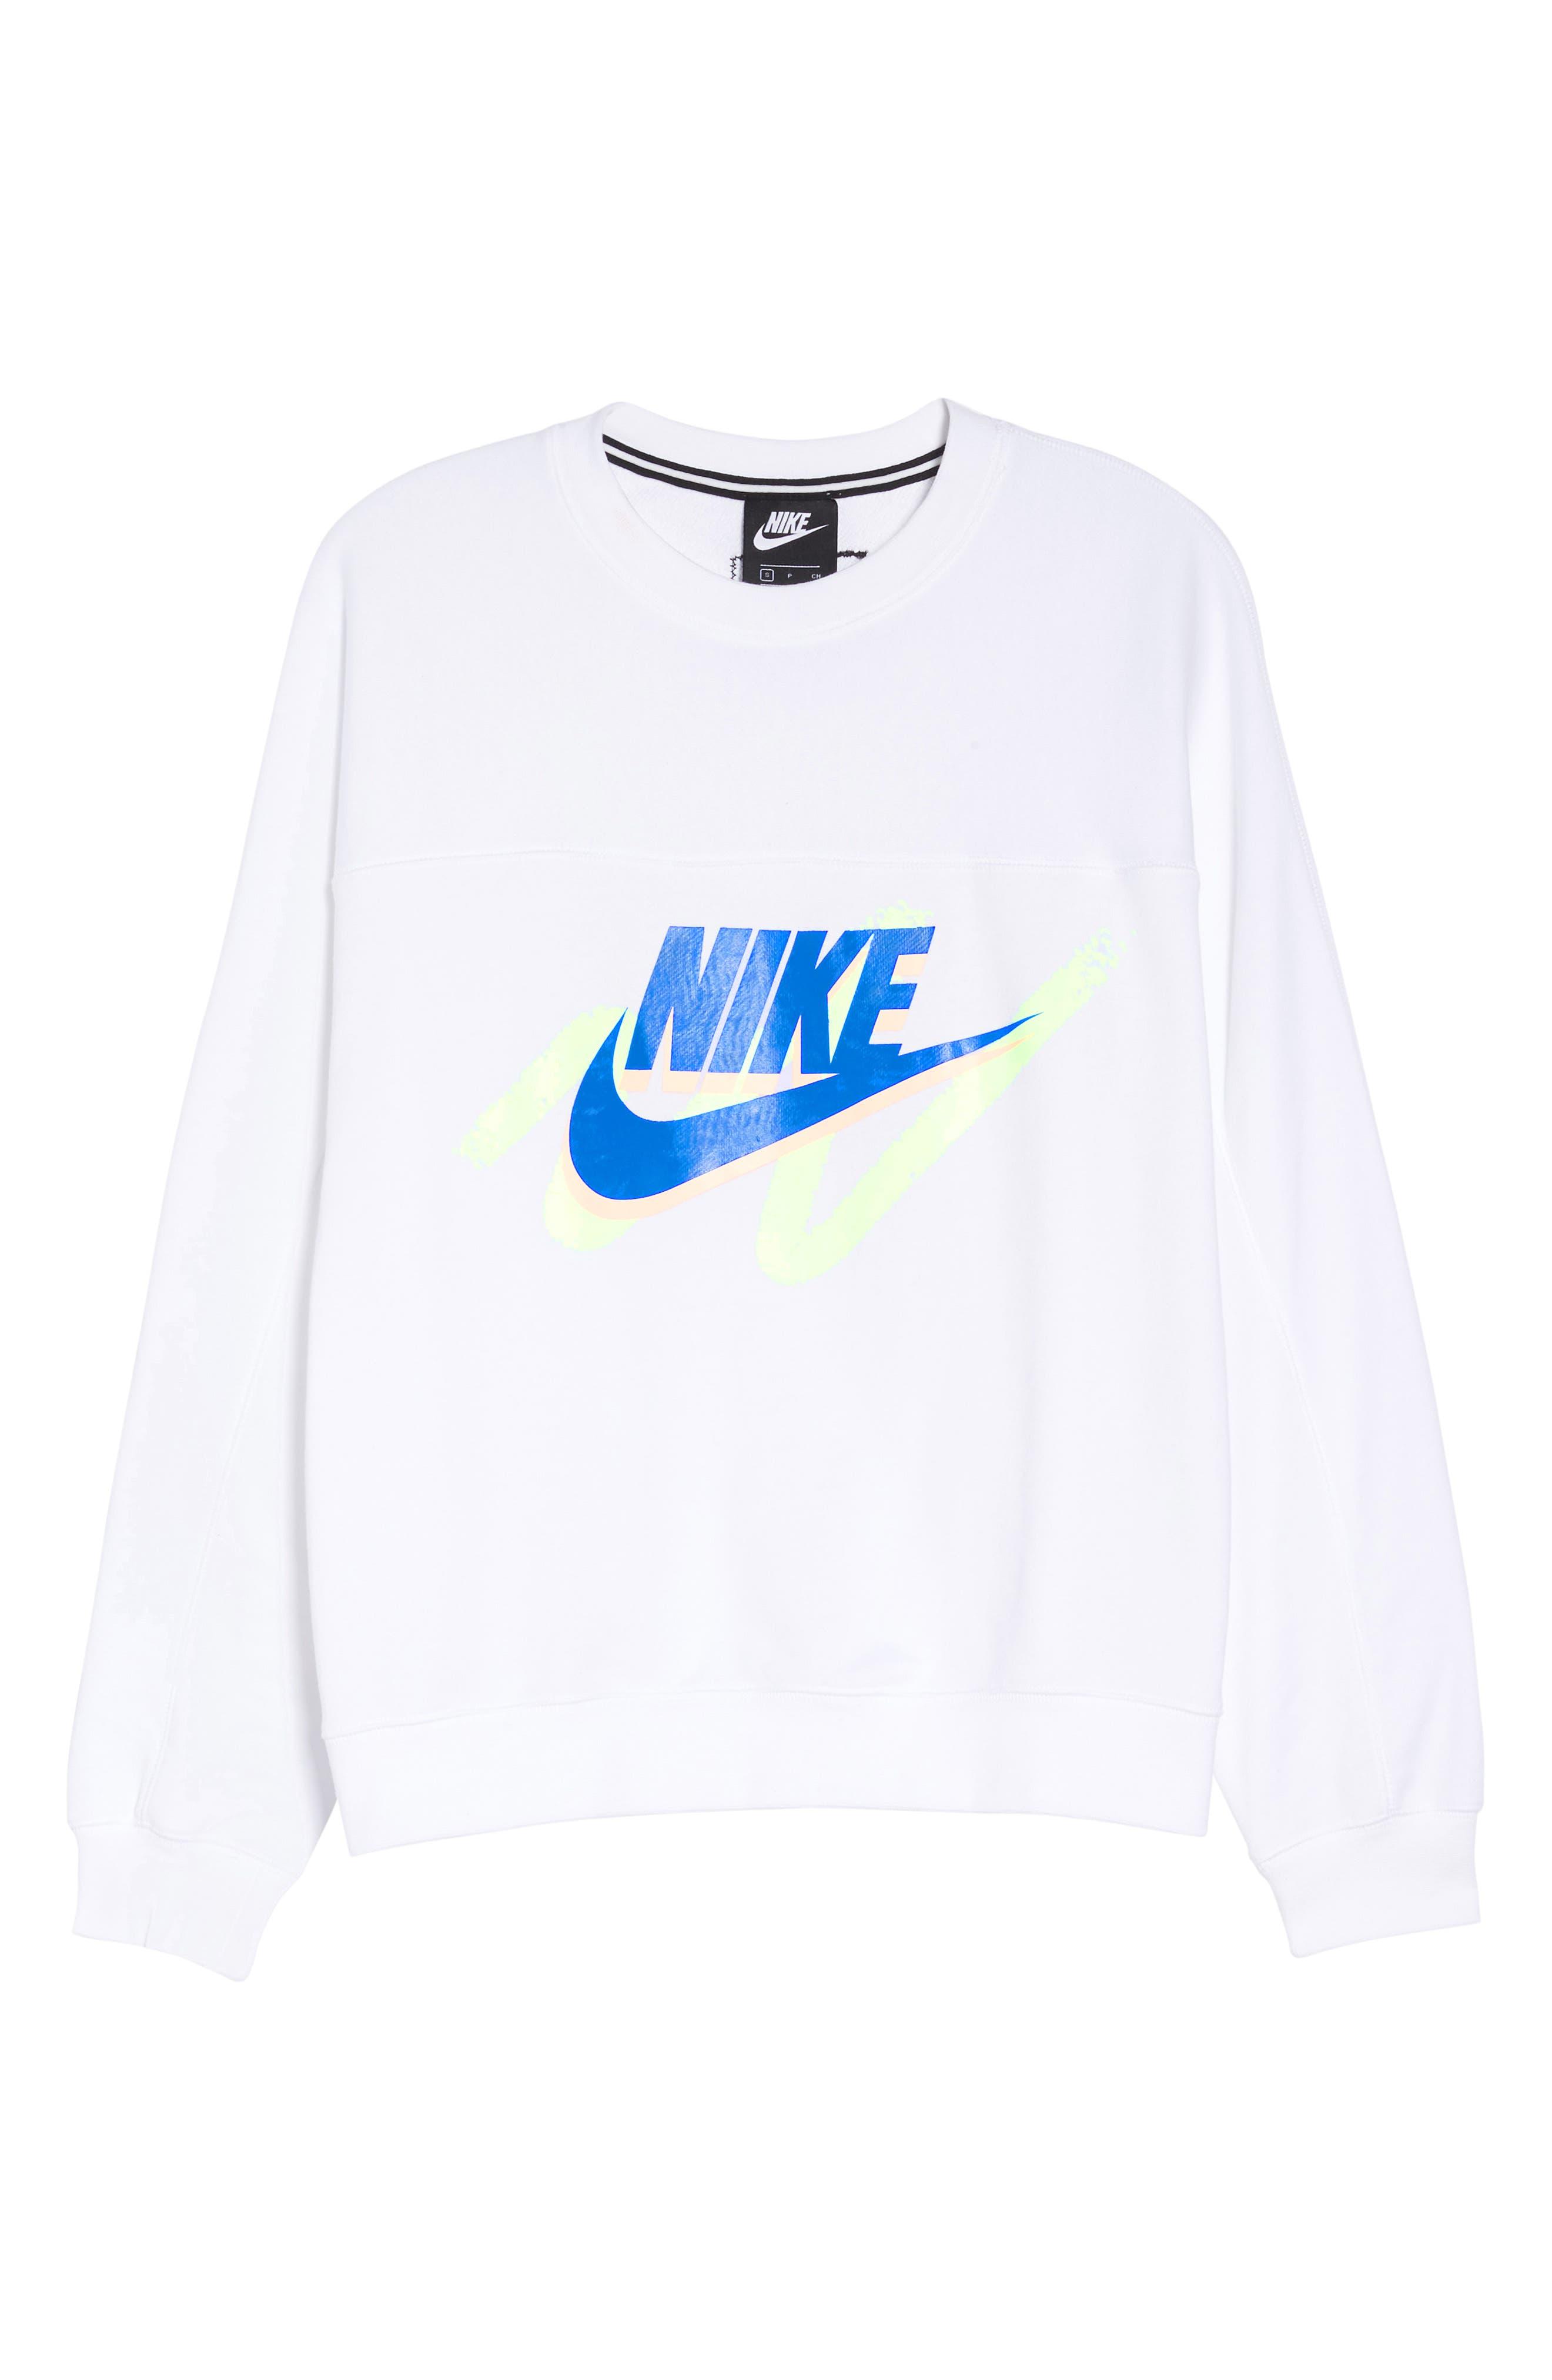 Sportswear Archive Women's Long Sleeve Crewneck Tee,                         Main,                         color, WHITE/ WHITE/ WHITE